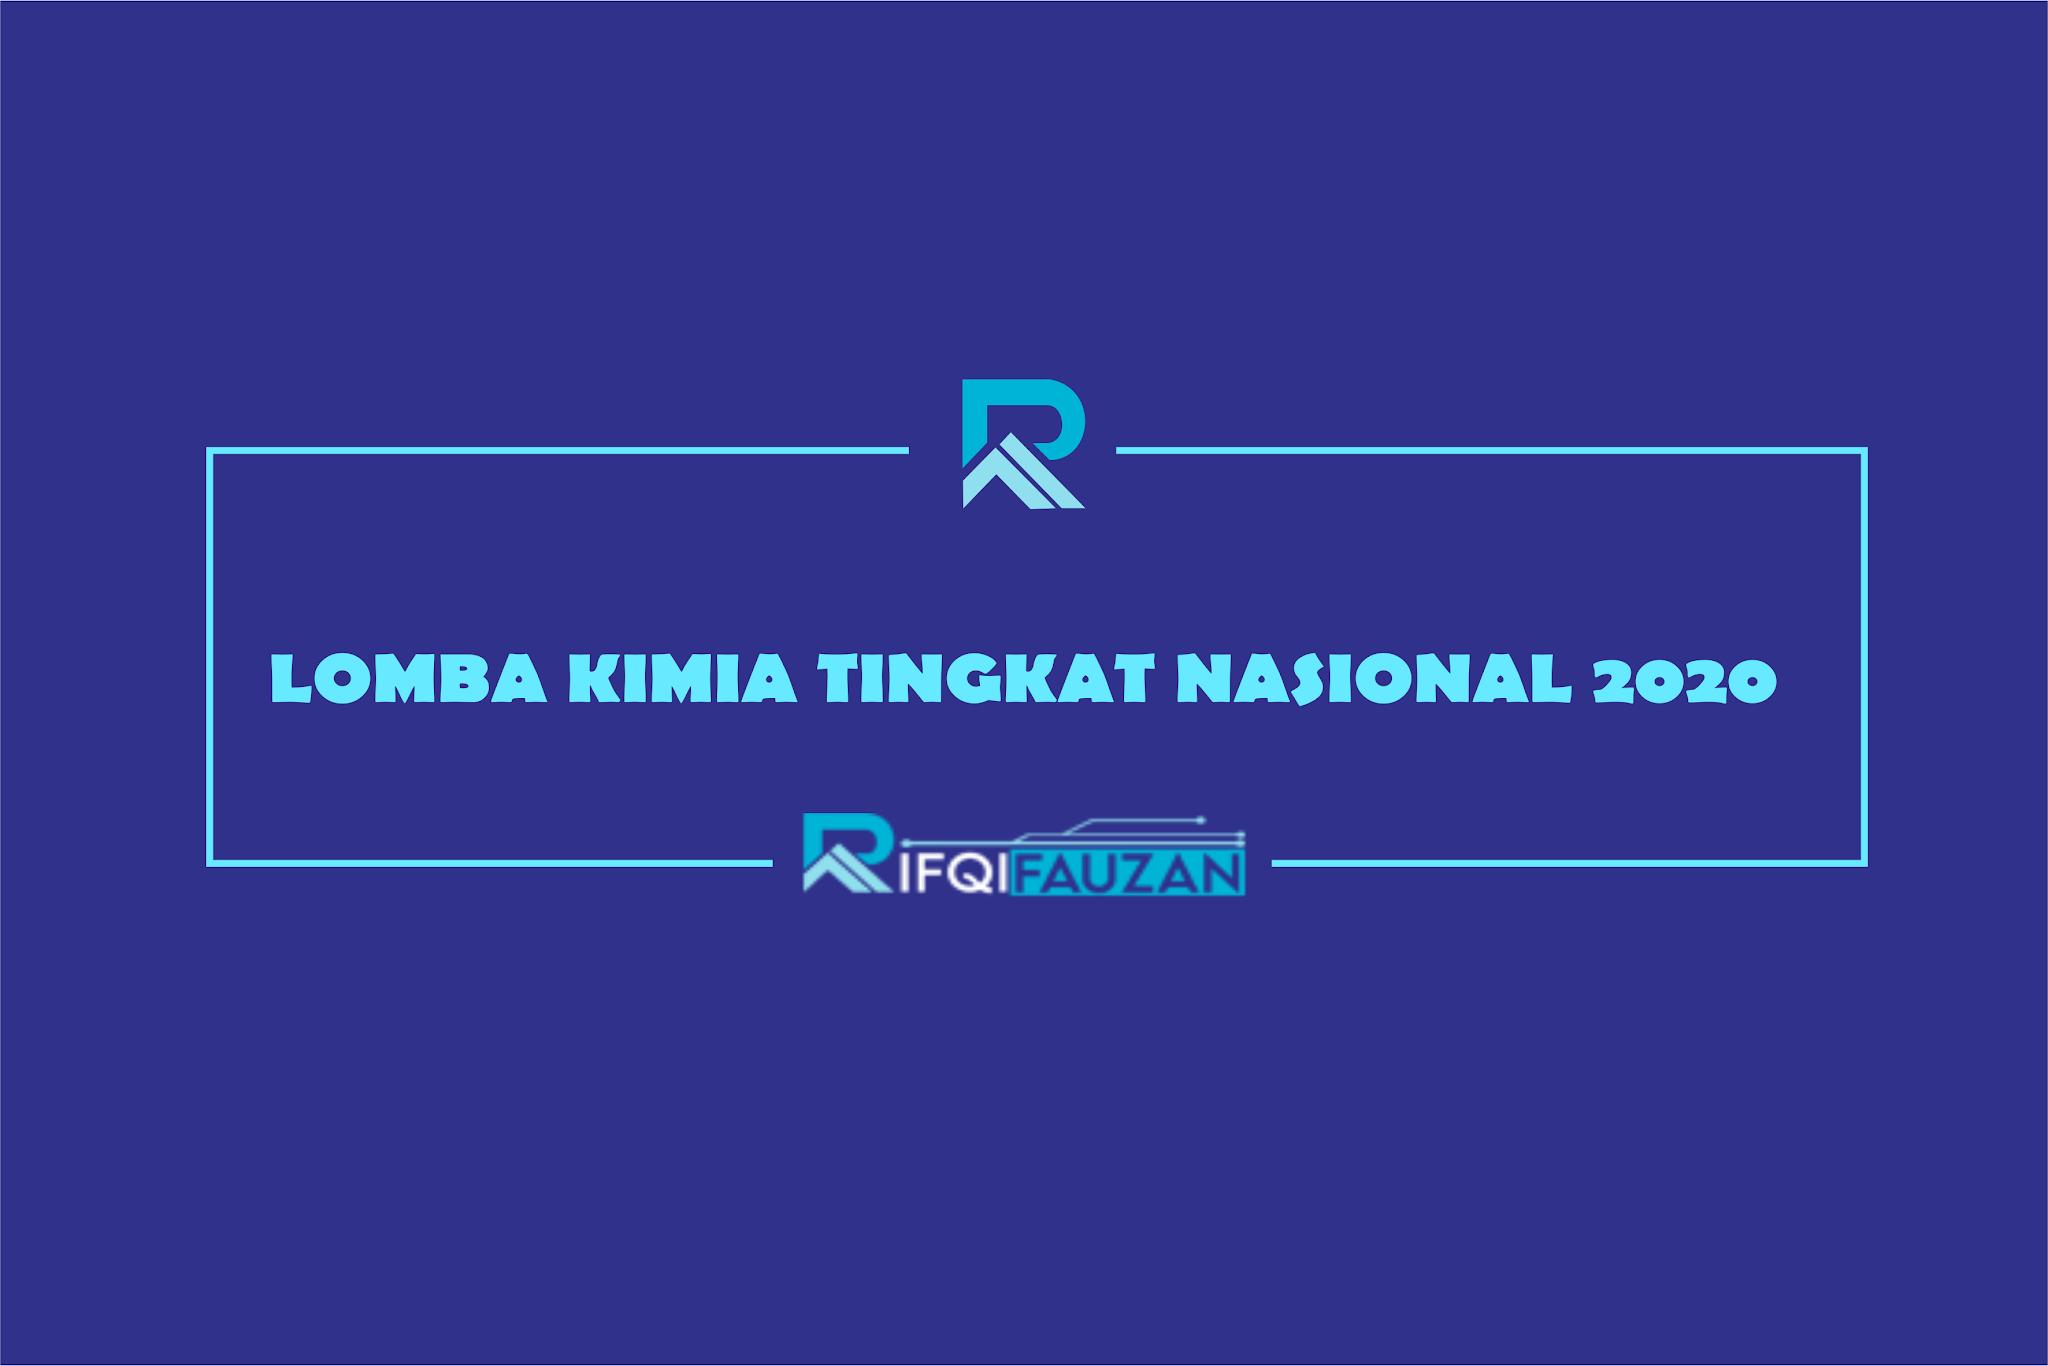 LOMBA BIDANG KIMIA TINGKAT NASIONAL 2020